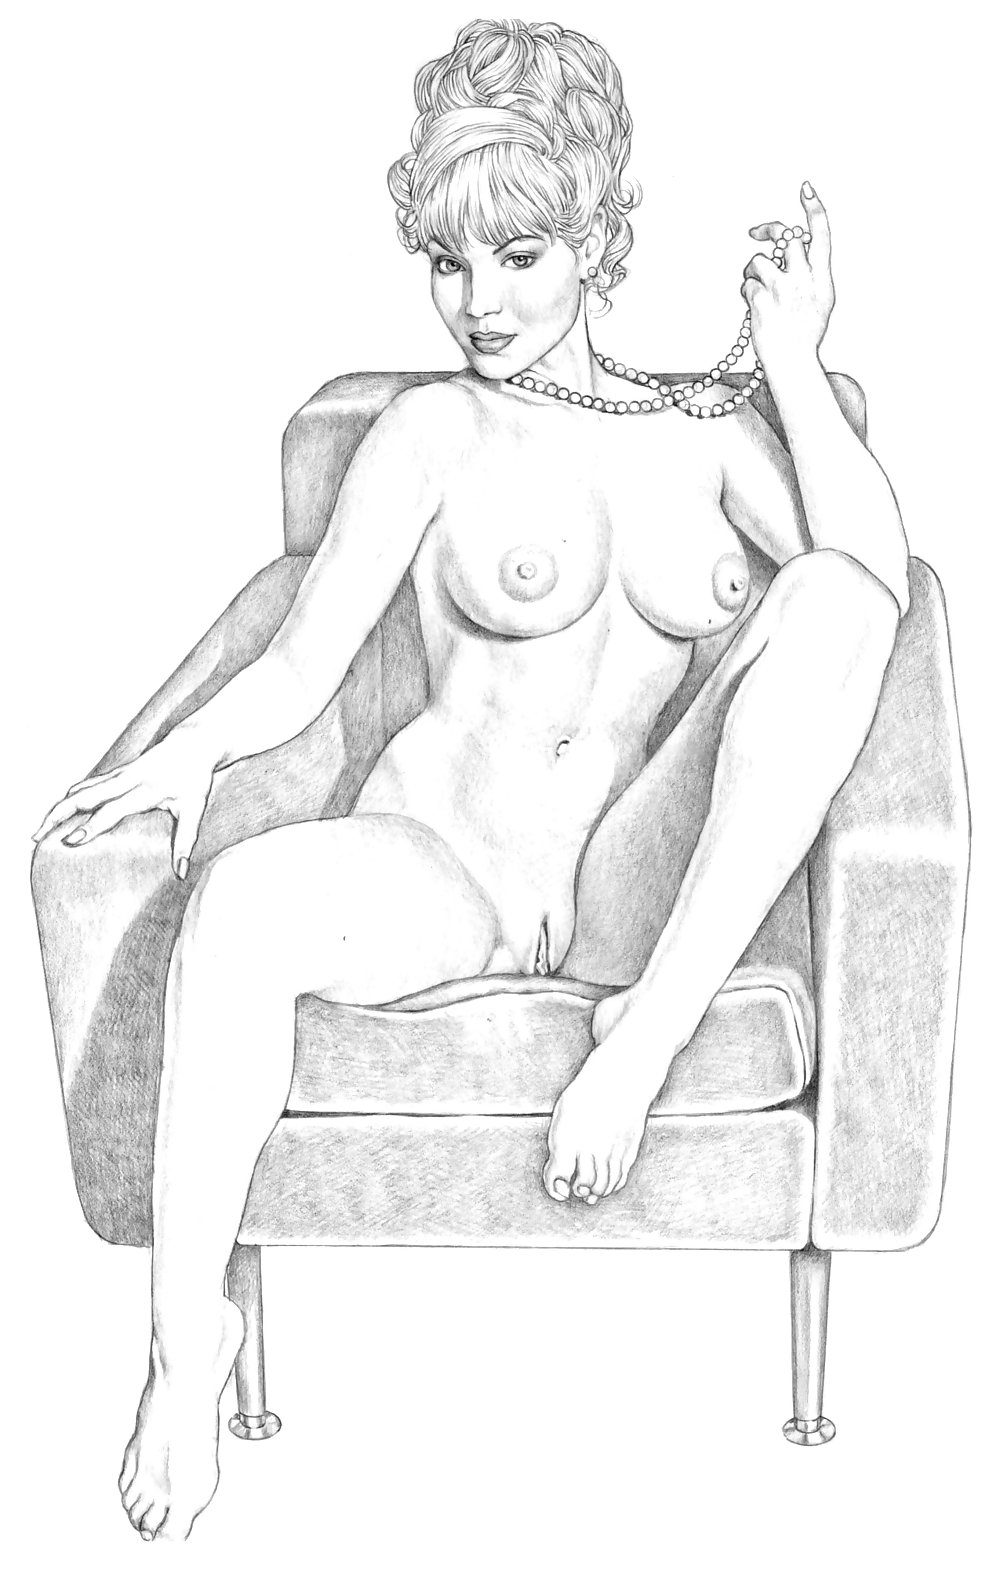 голые девушки интим рисунки карандашом болгарии можно